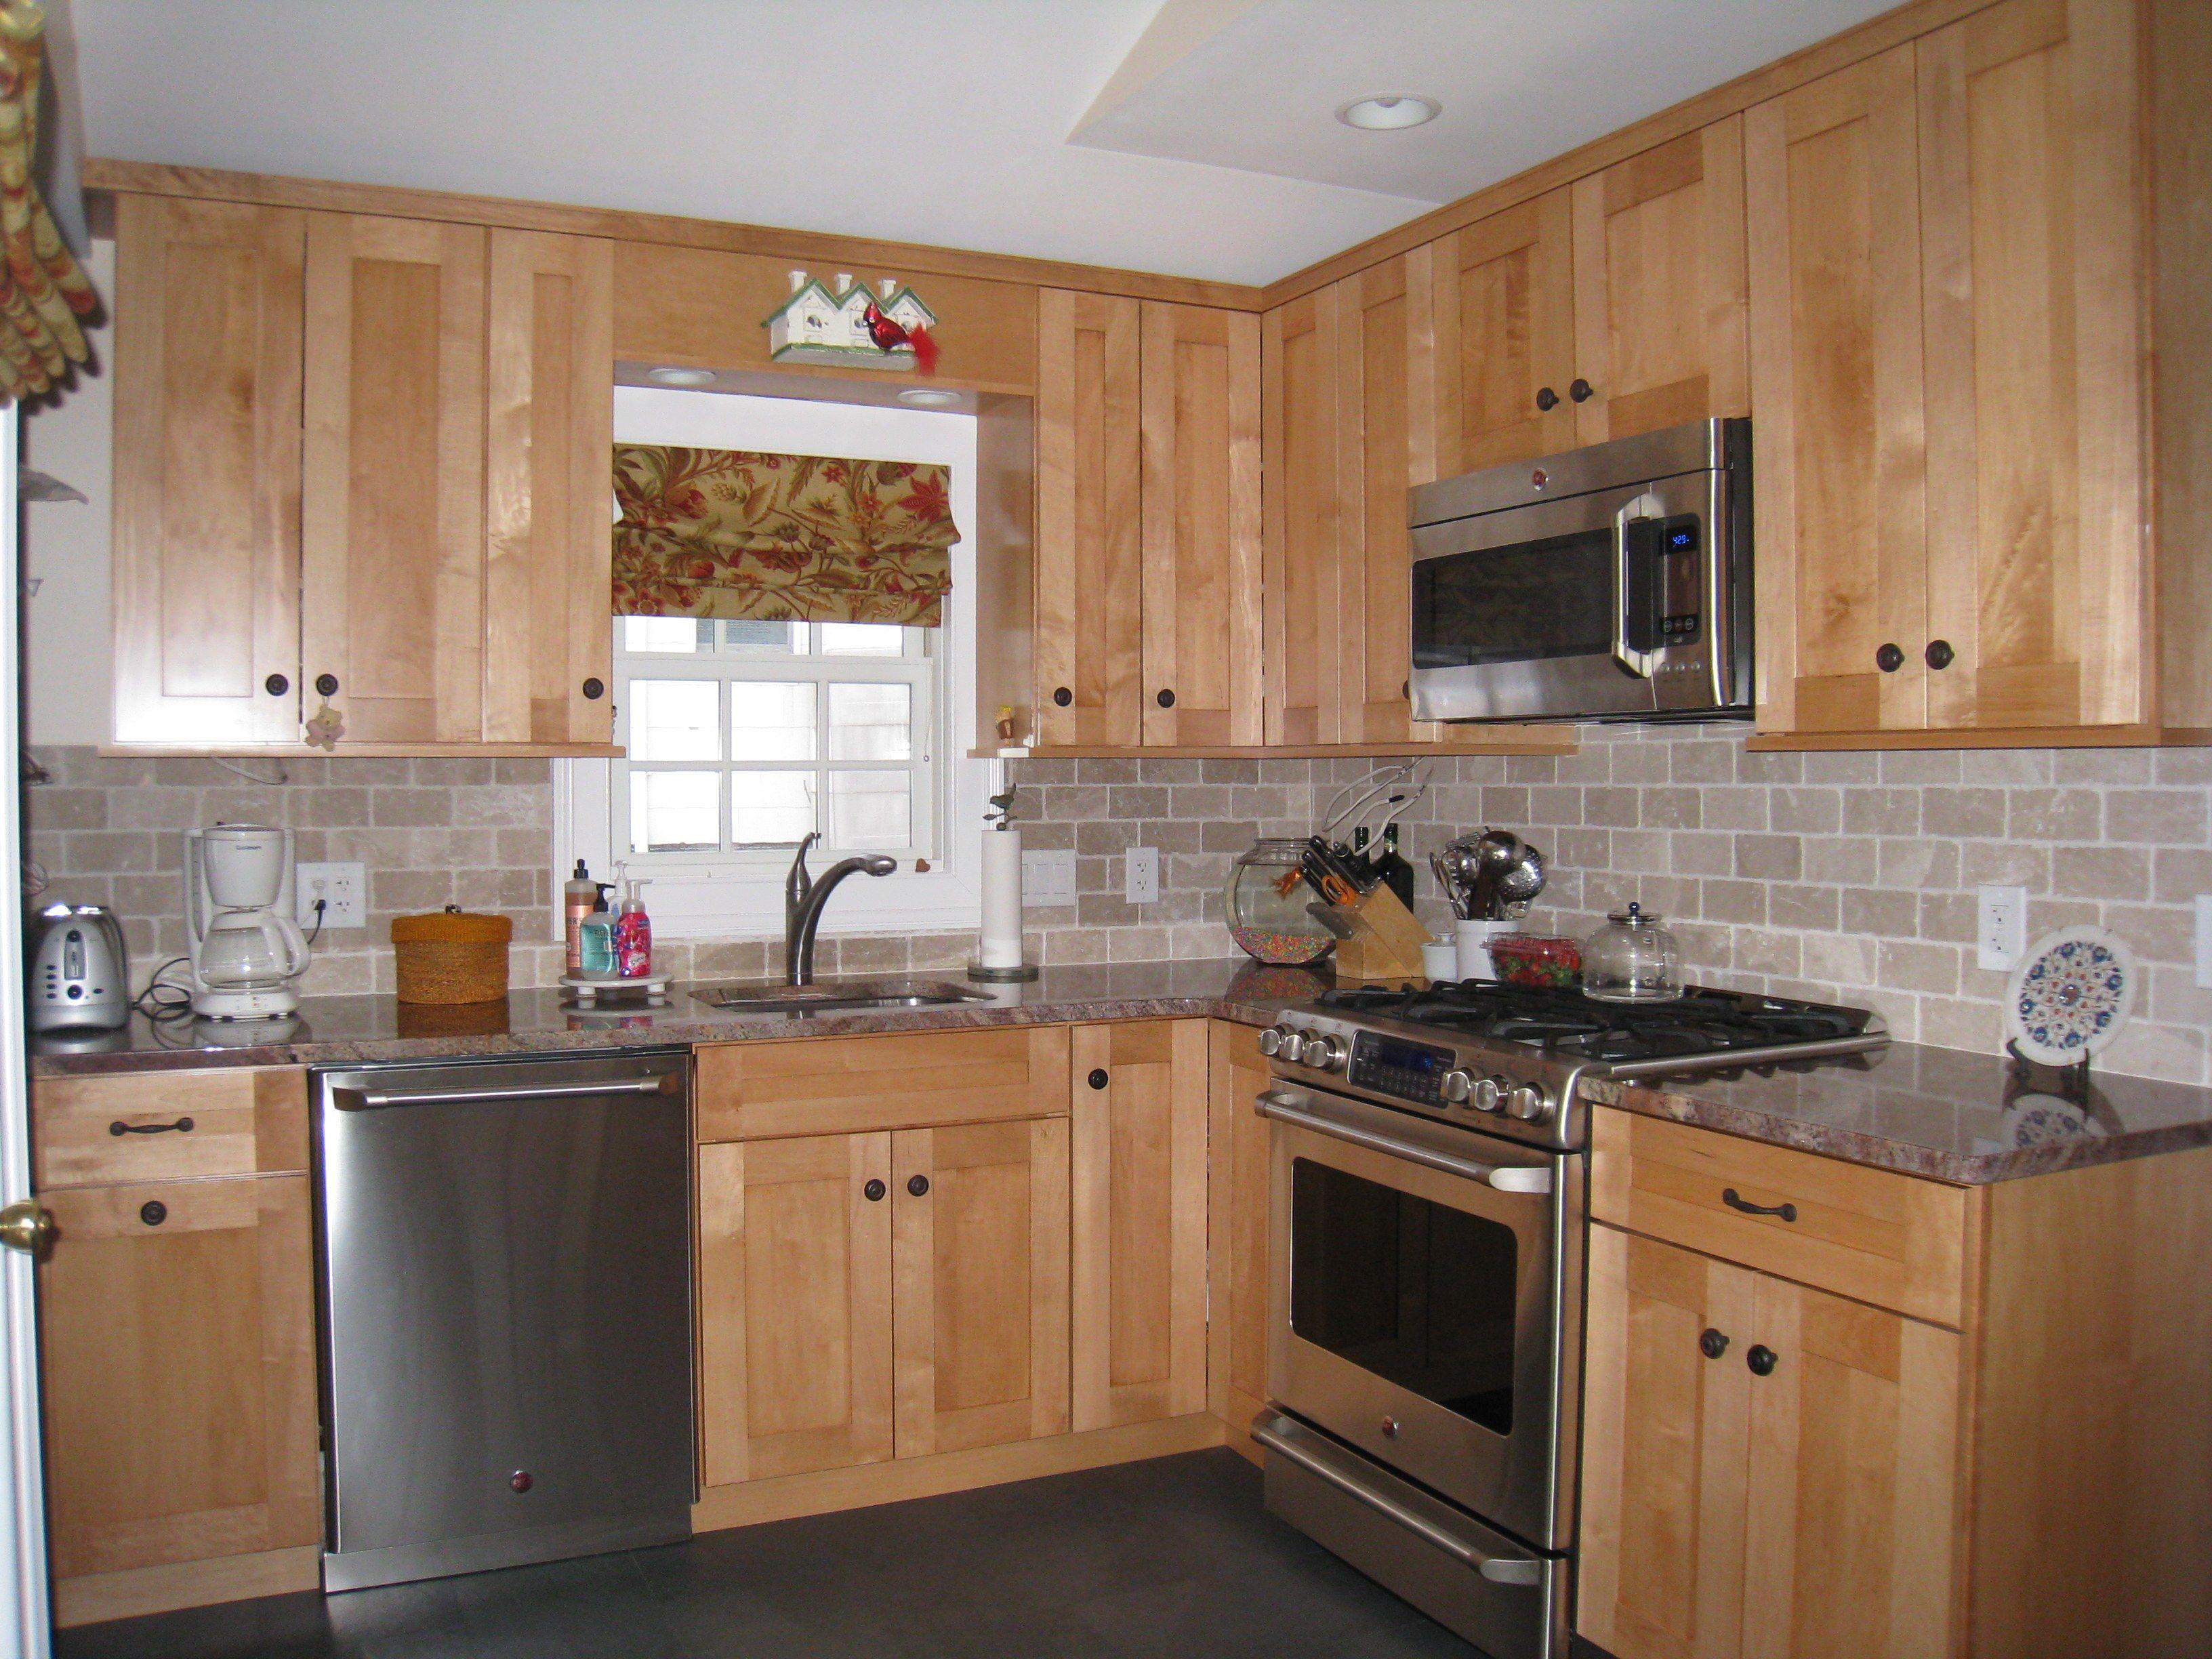 maple kitchen cabinets Kitchen cabinets